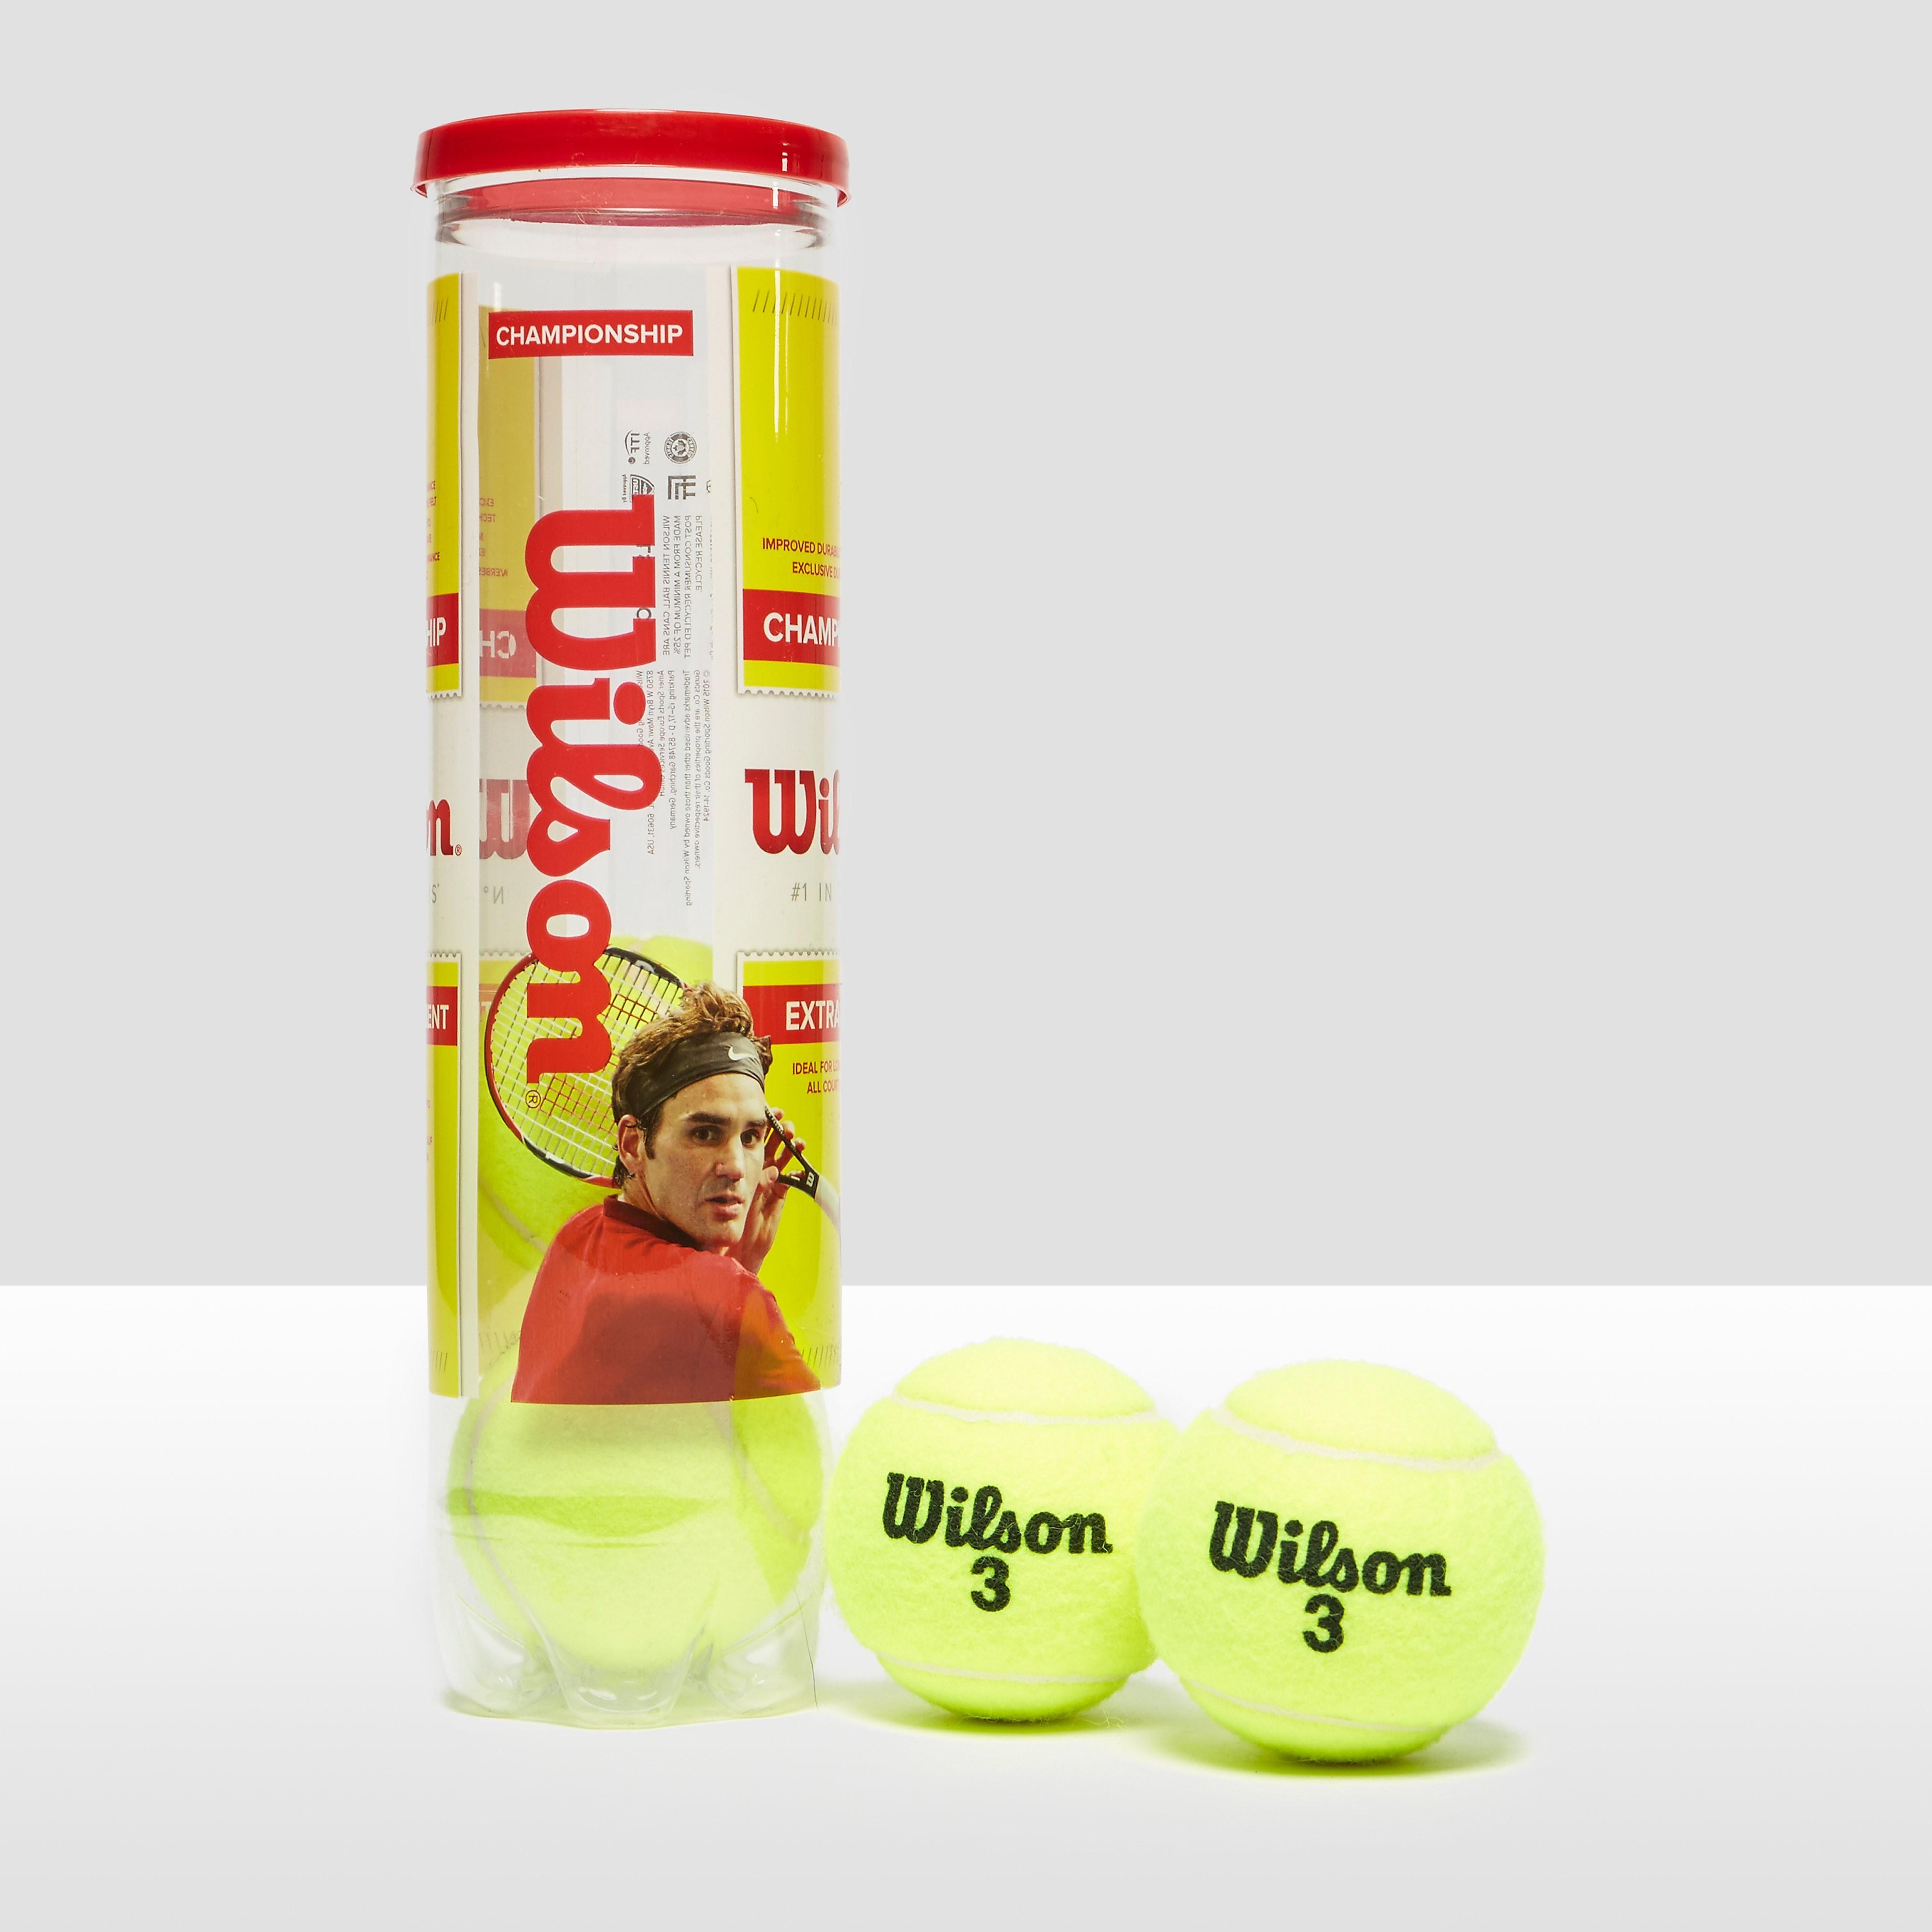 Wilson Championship XD Tennis Ball Can (4-balls per can)